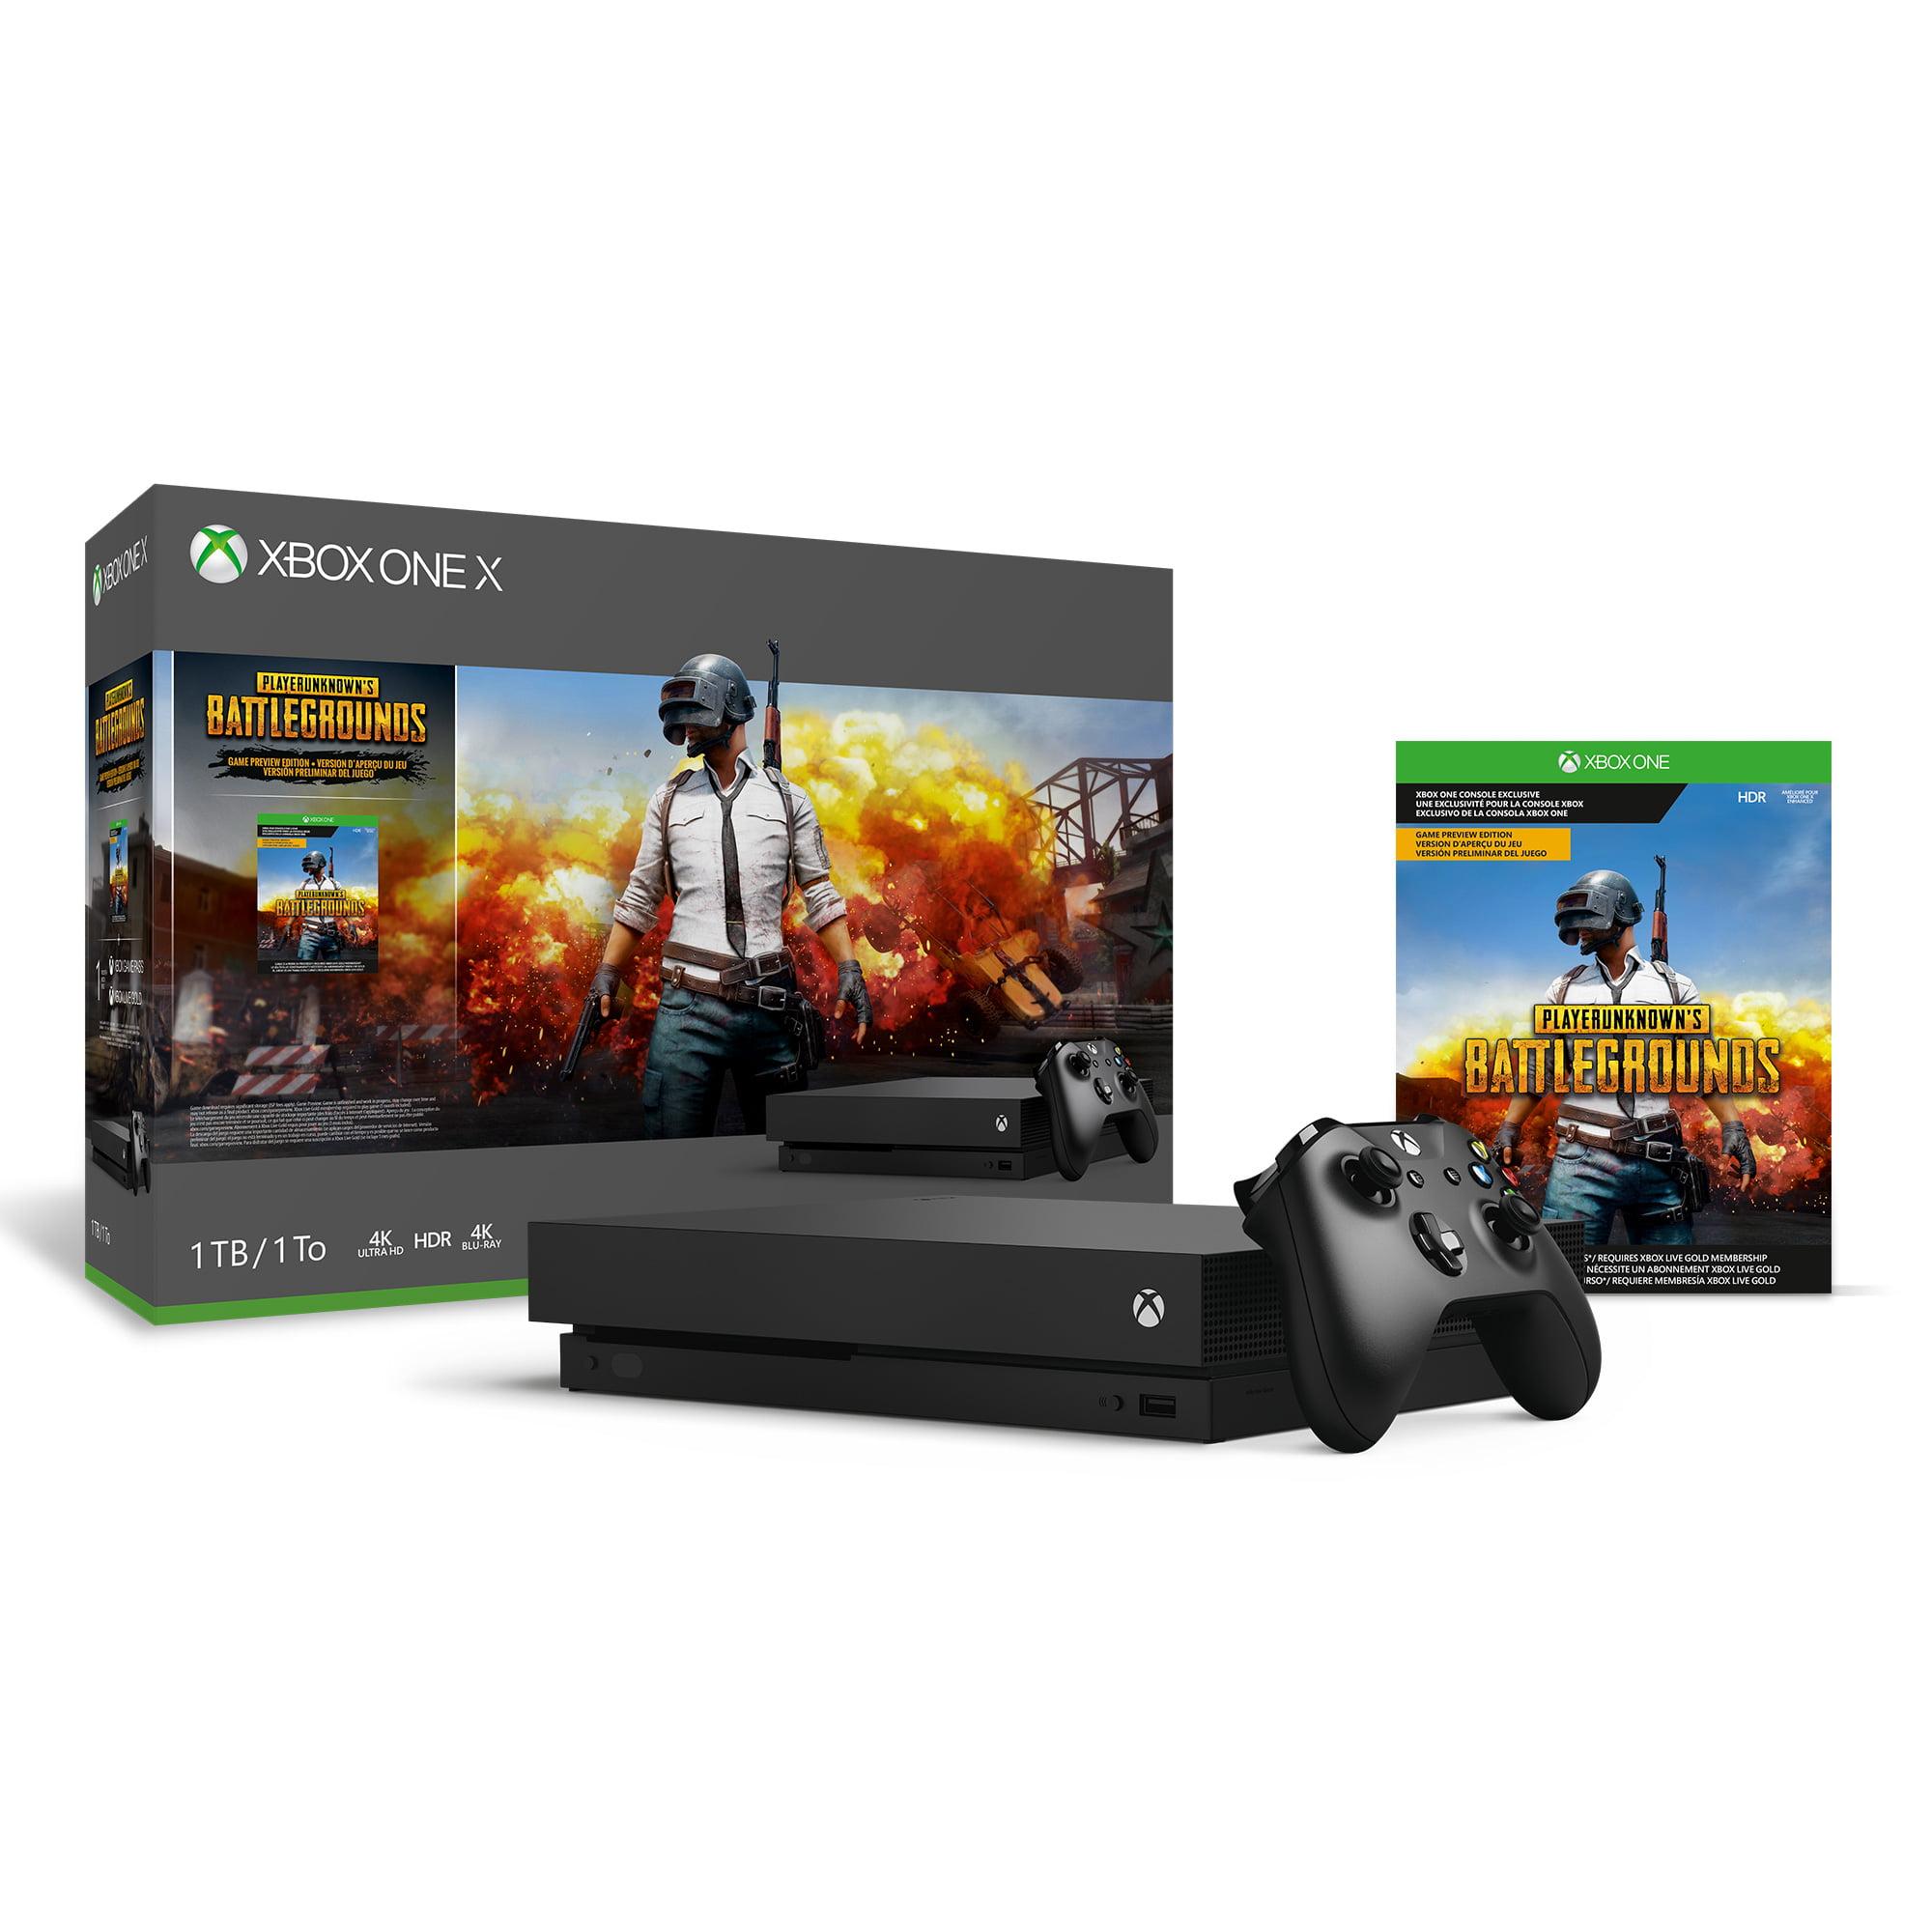 Microsoft Xbox One X PLAYERUNKNOWN'S BATTLEGROUNDS Bundle